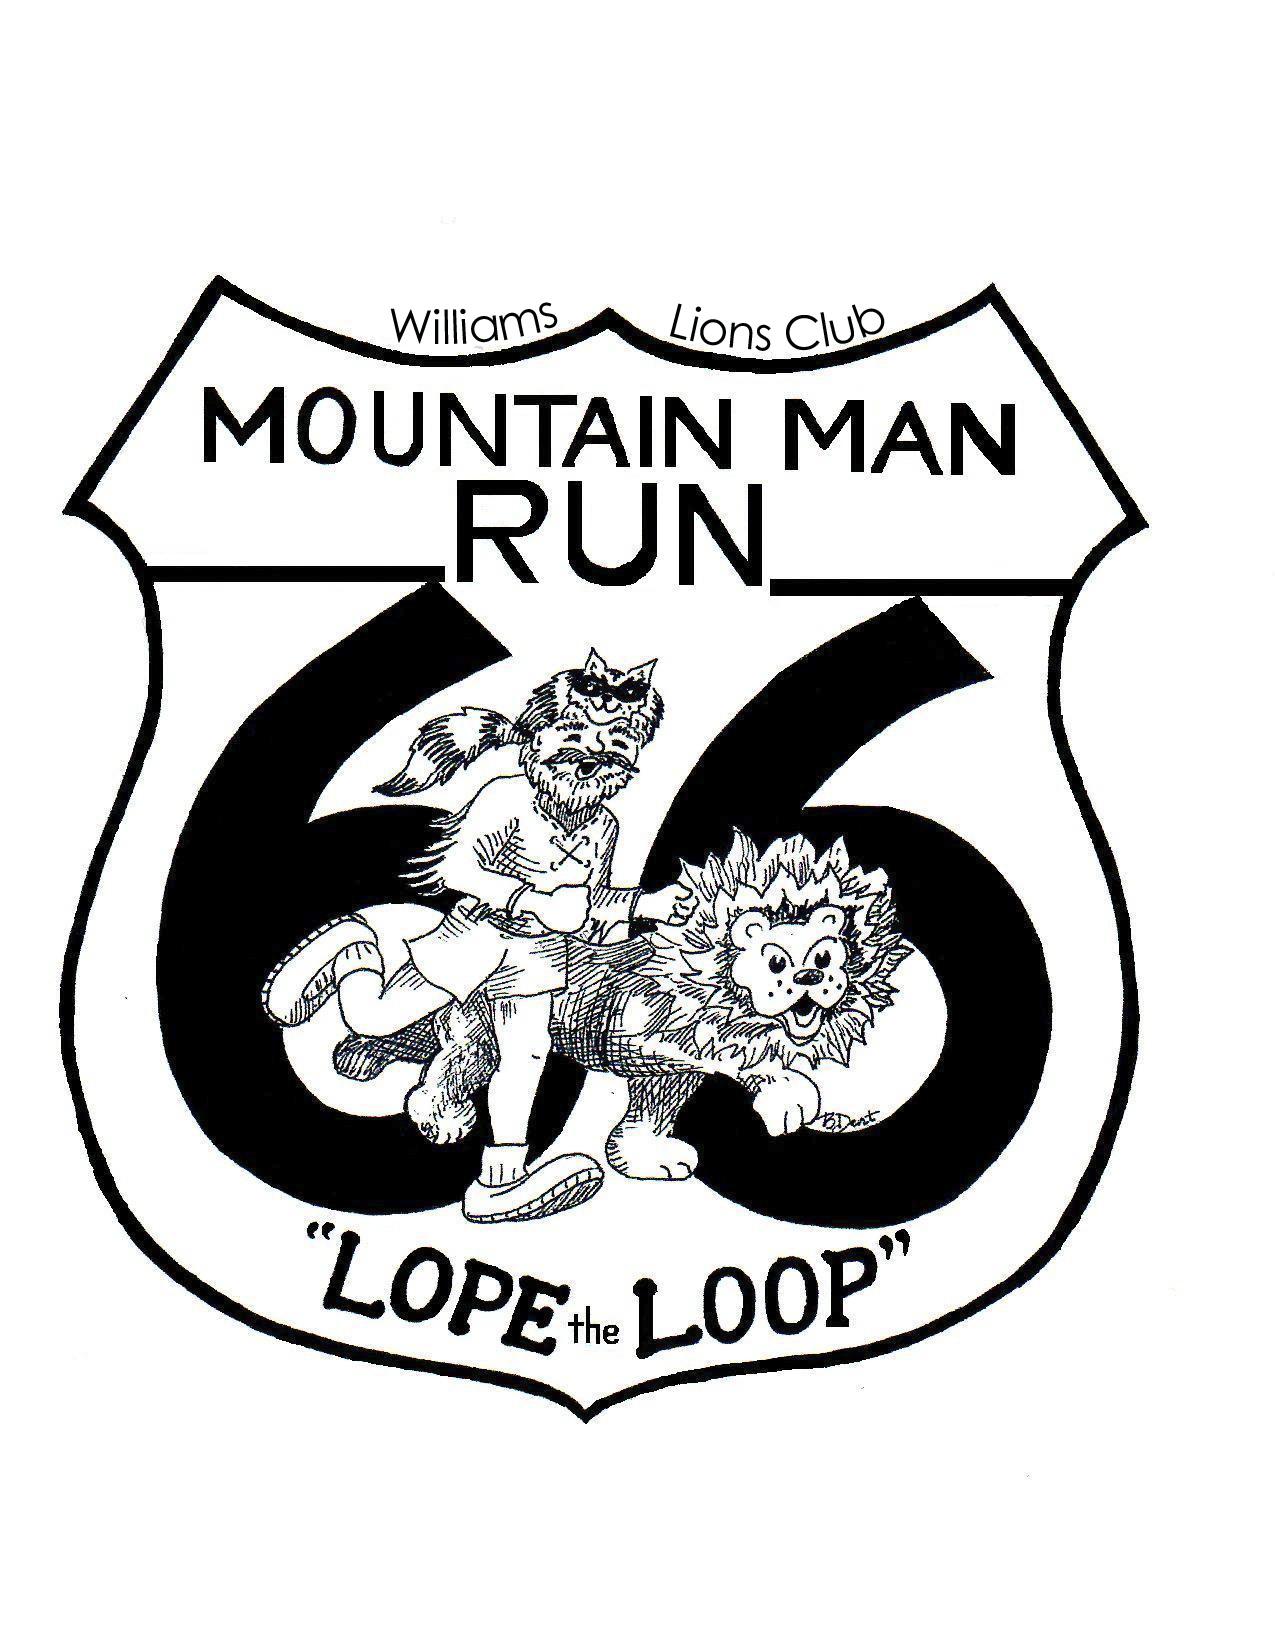 Logo with Williams Lions Club.jpg